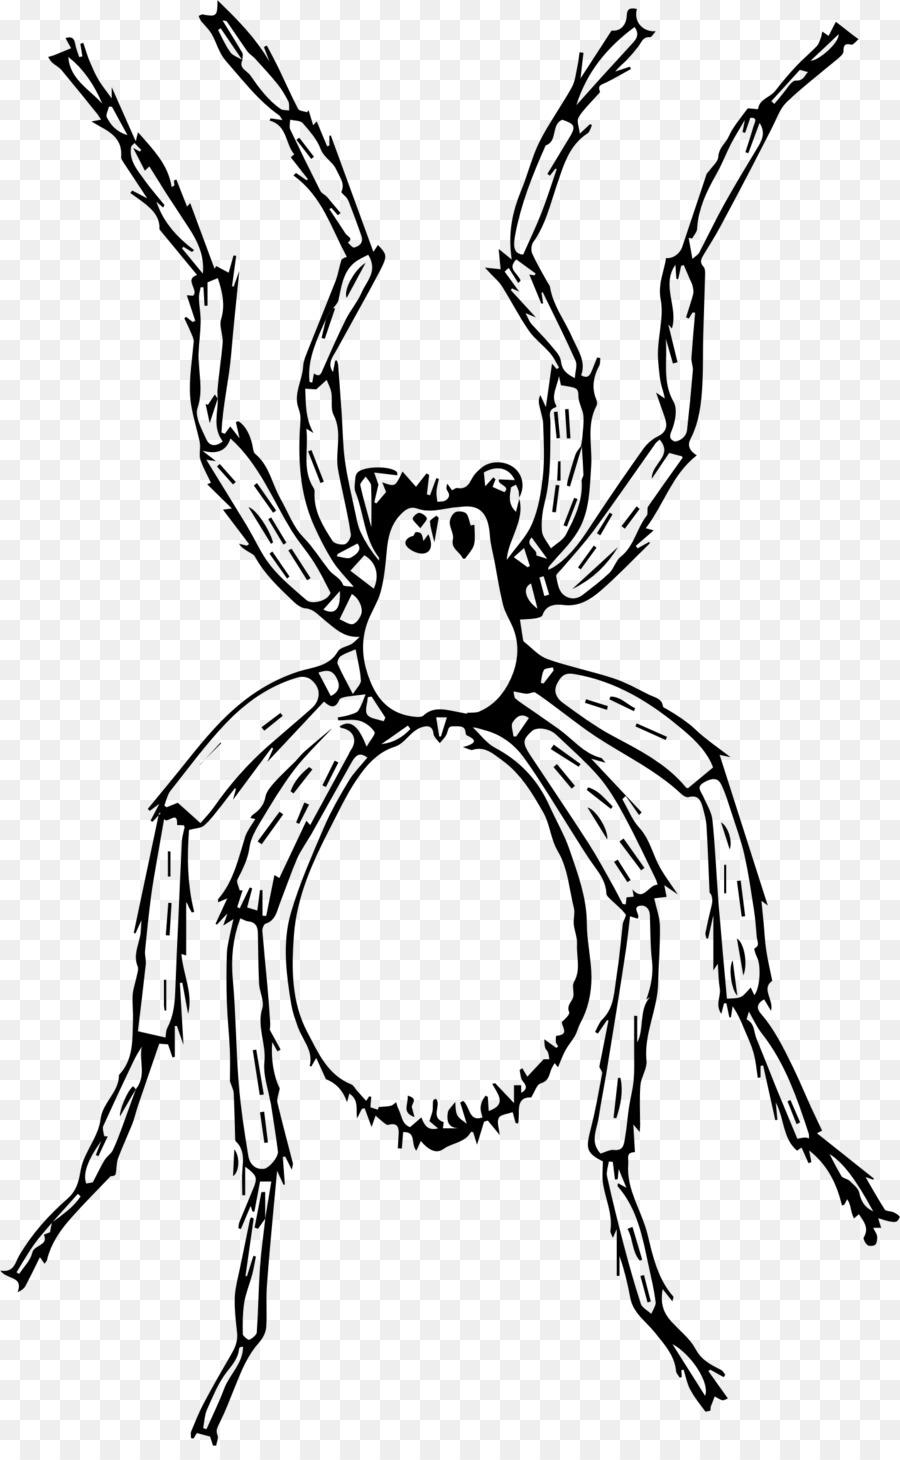 Miss Spider Dibujo Tía Esponja Clip art - araña png dibujo ...